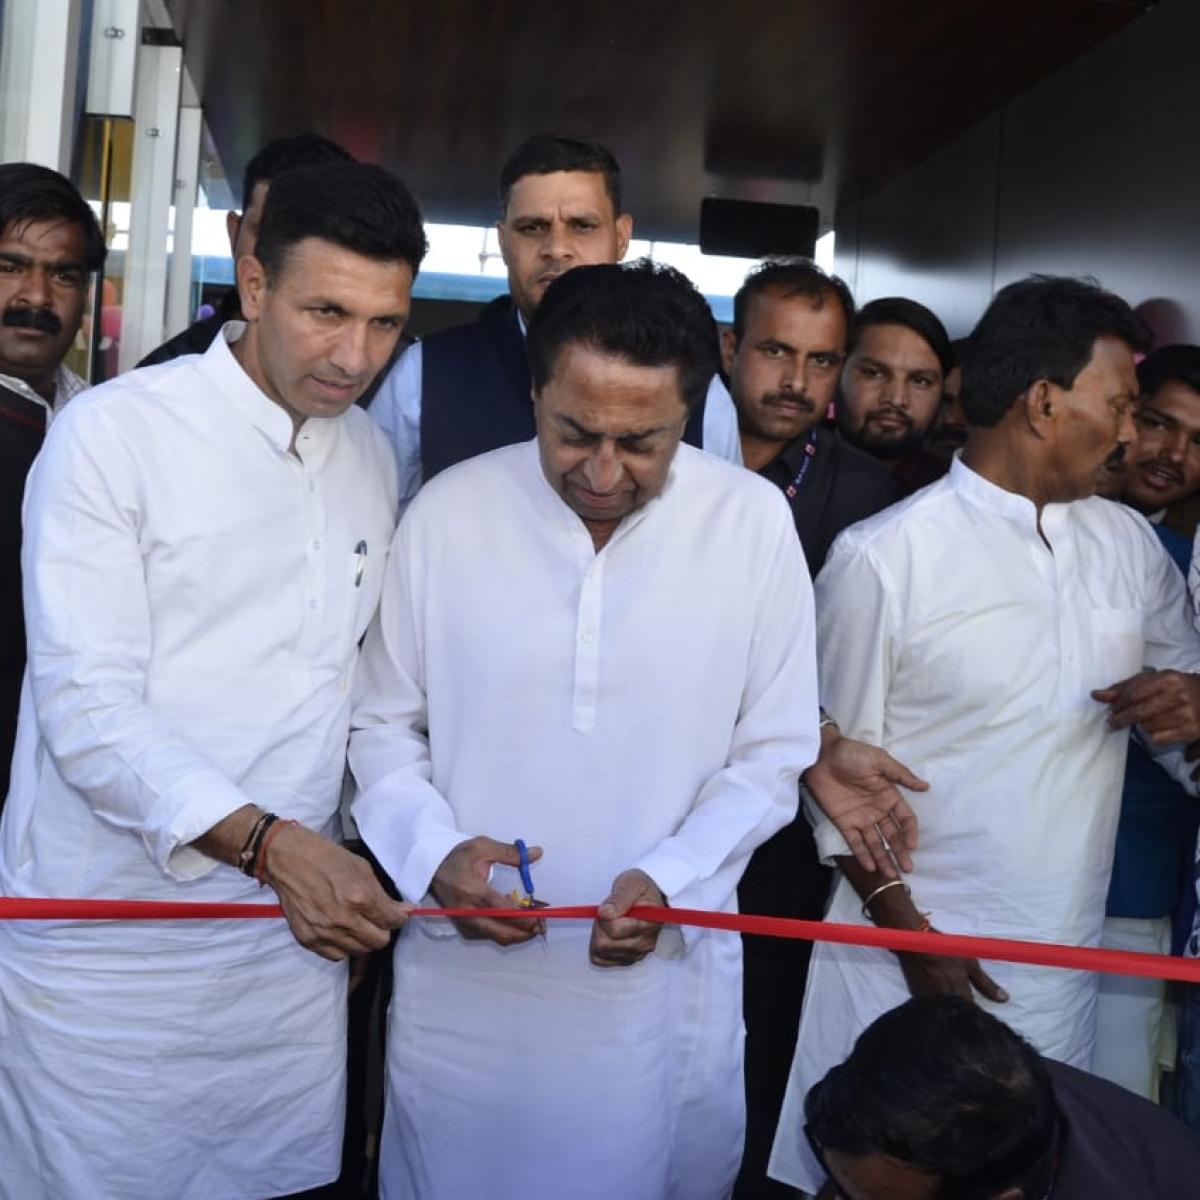 Indore: CM Kamal Nath launches 10 buses between Rajiv Gandhi square & Rau